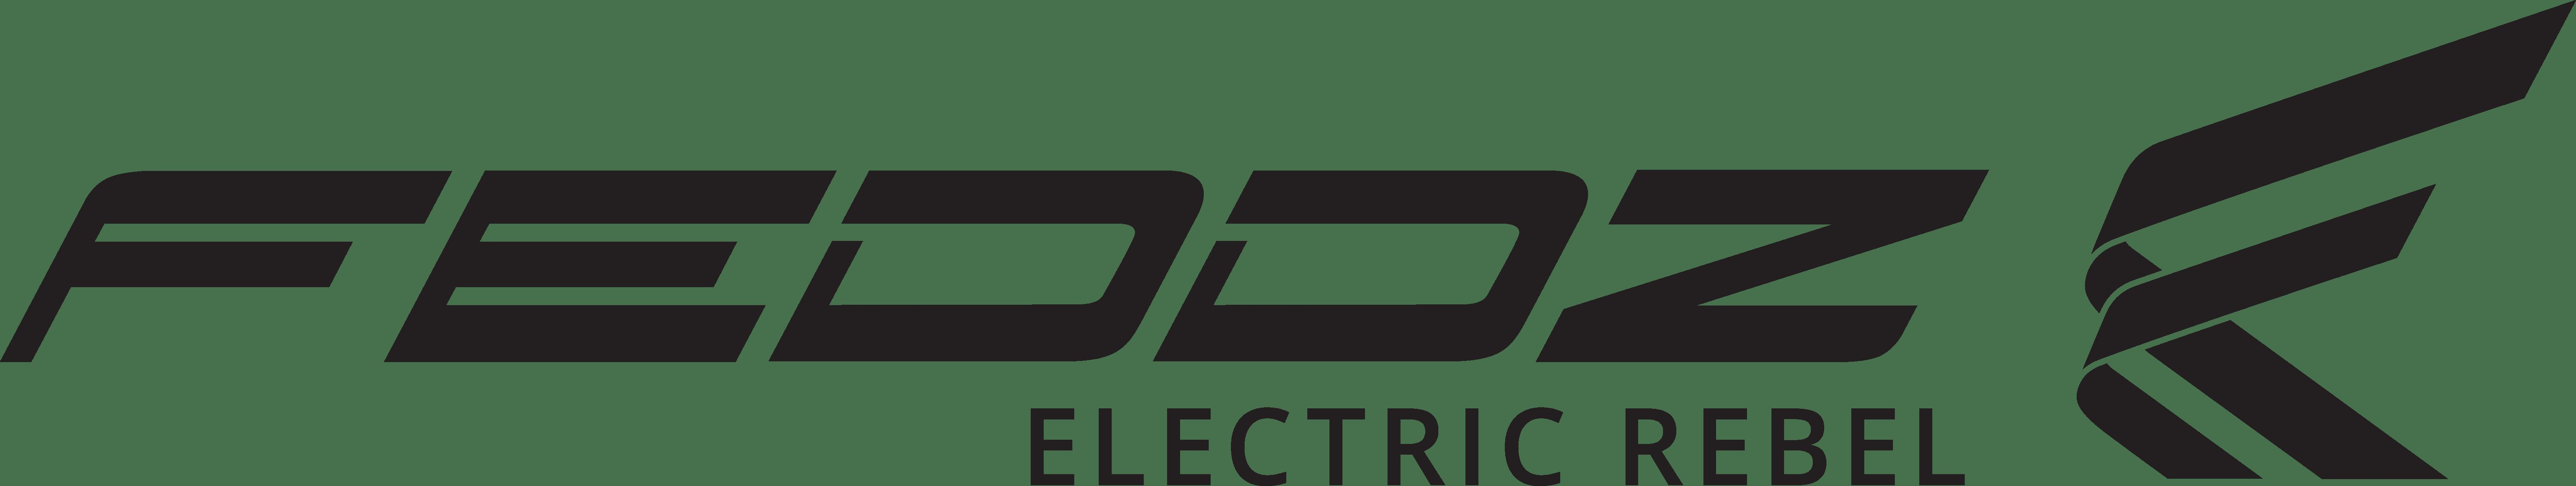 Partner FEDDZ